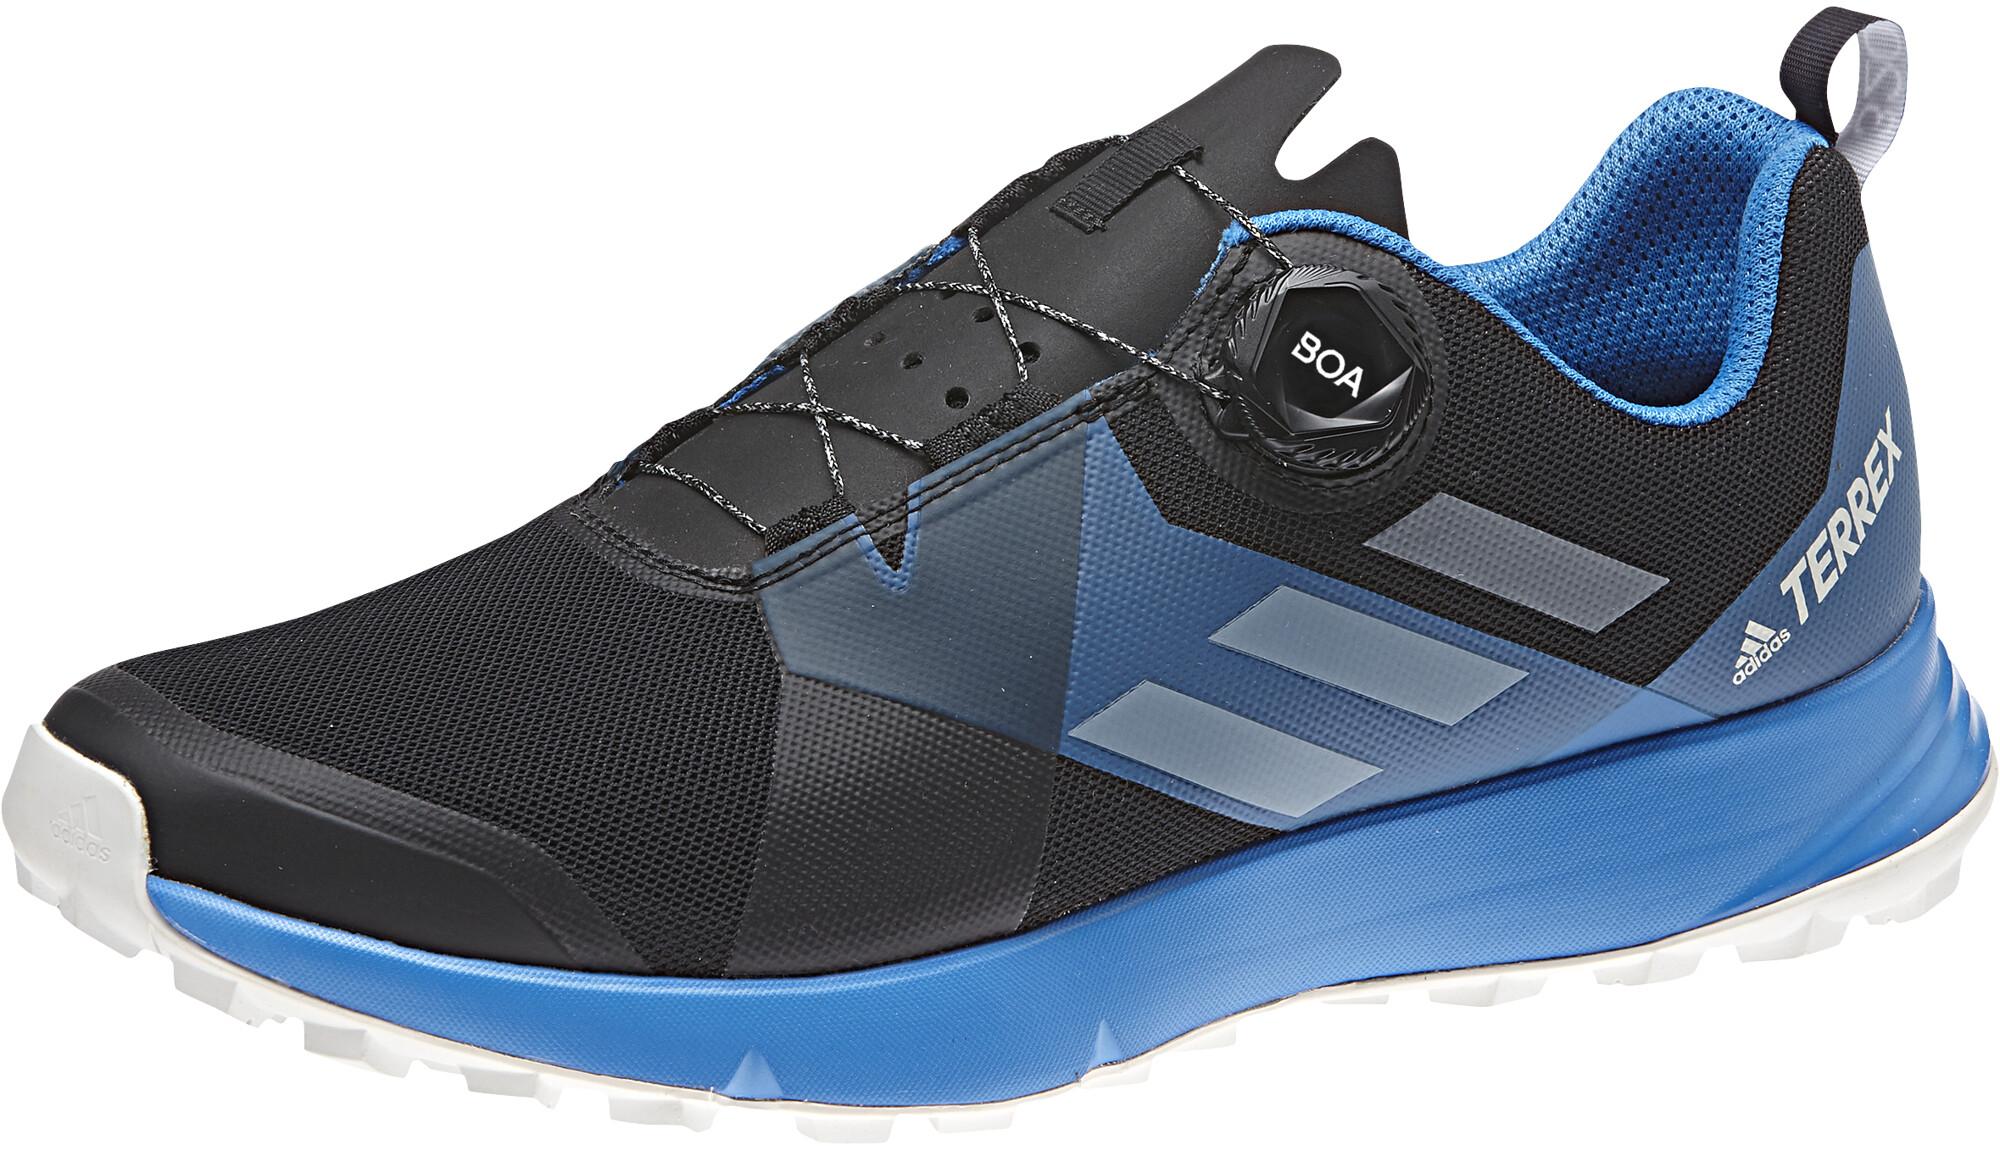 buy online 29b85 4d307 adidas TERREX Two Boa scarpe da corsa Uomo blu nero